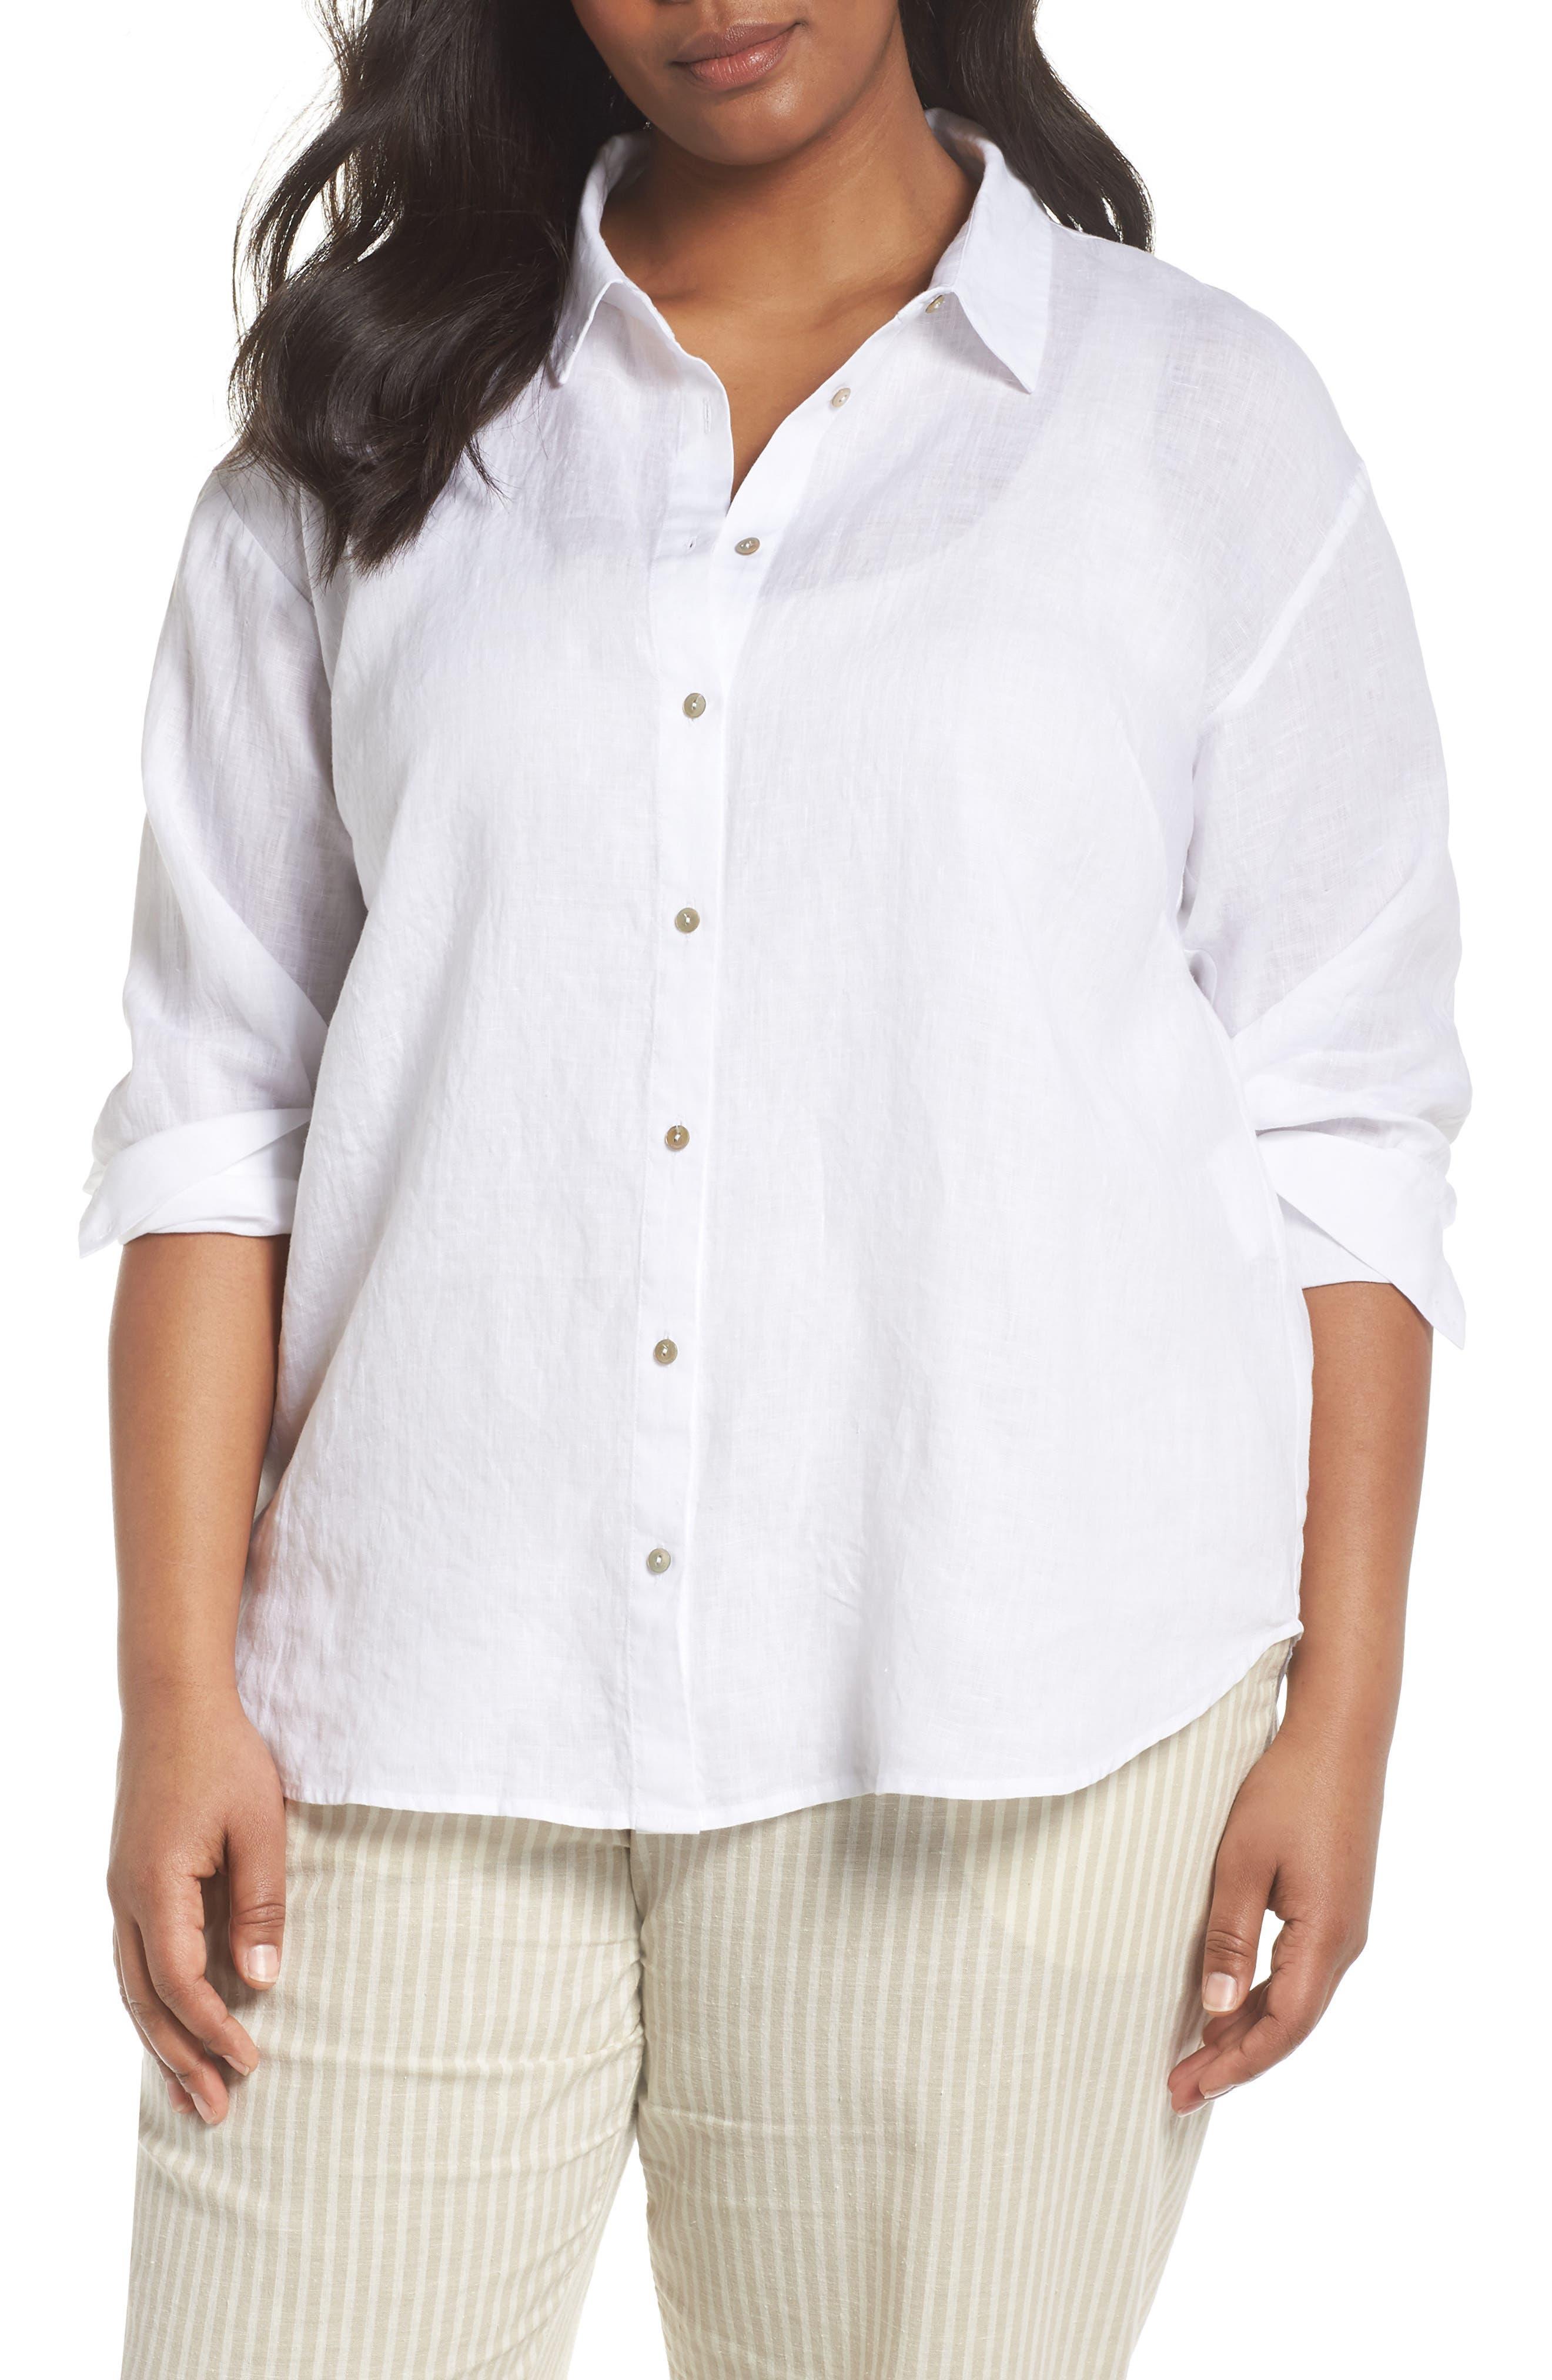 Organic Linen Shirt,                             Main thumbnail 1, color,                             100